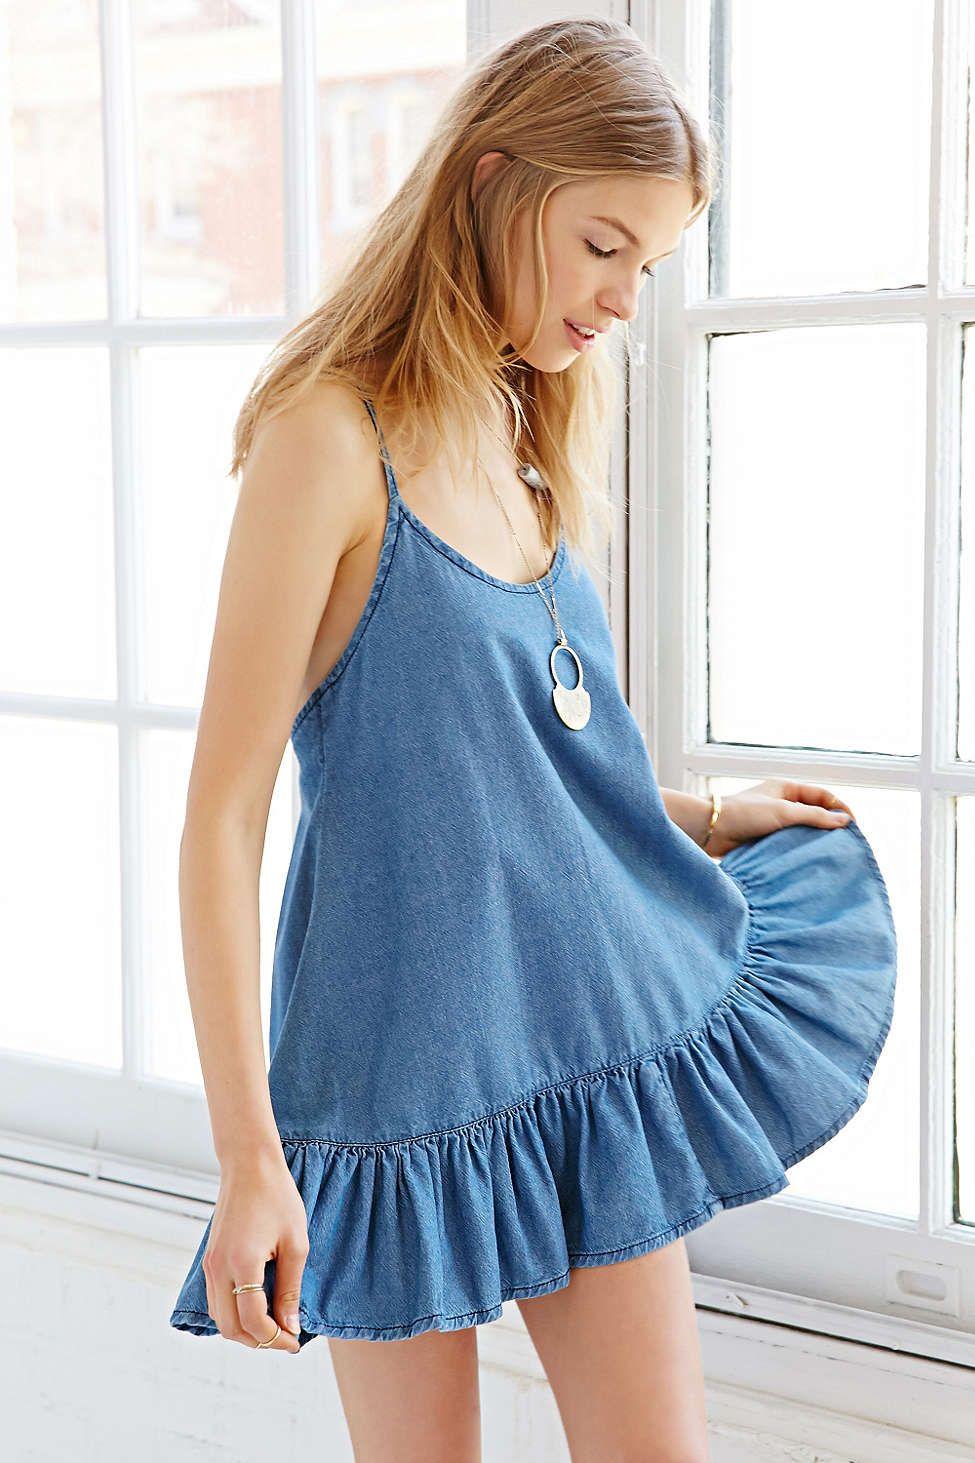 One Teaspoon Lotus Dress - Urban Outfitters